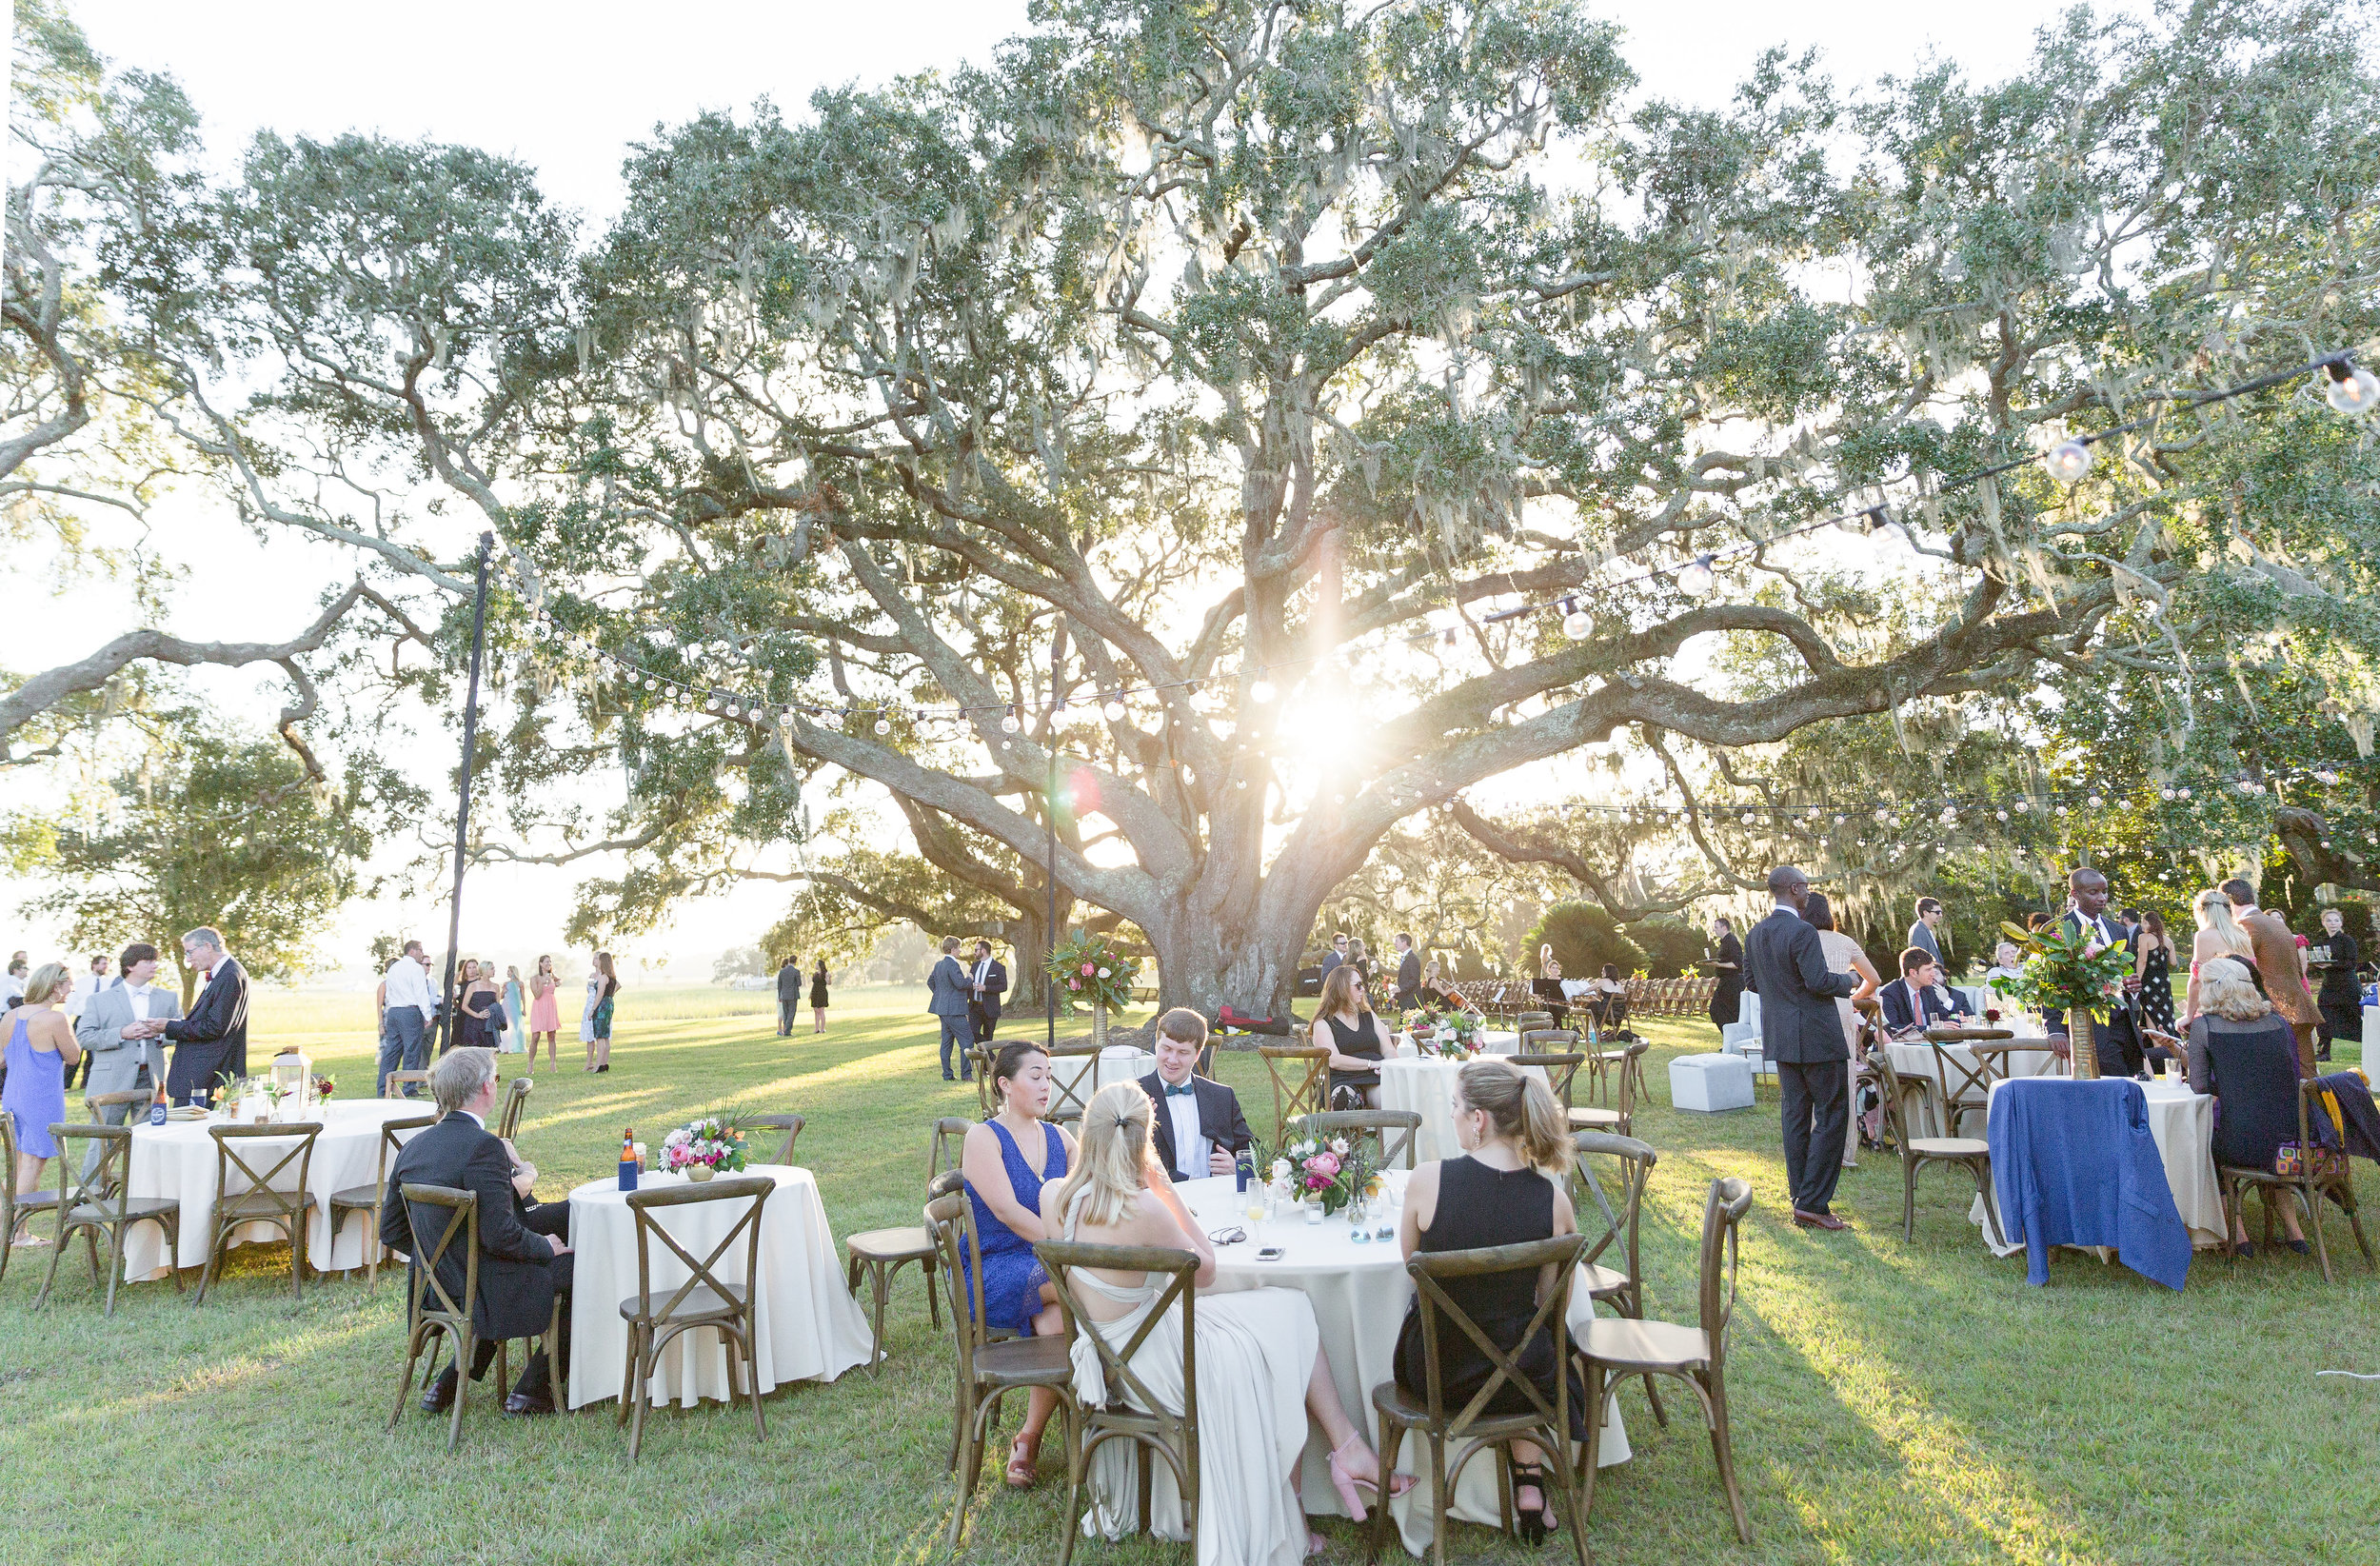 Carrie + Douglas: Dream Edisto Island Wedding at Cypress Trees Plantation | Palmetto State Weddings